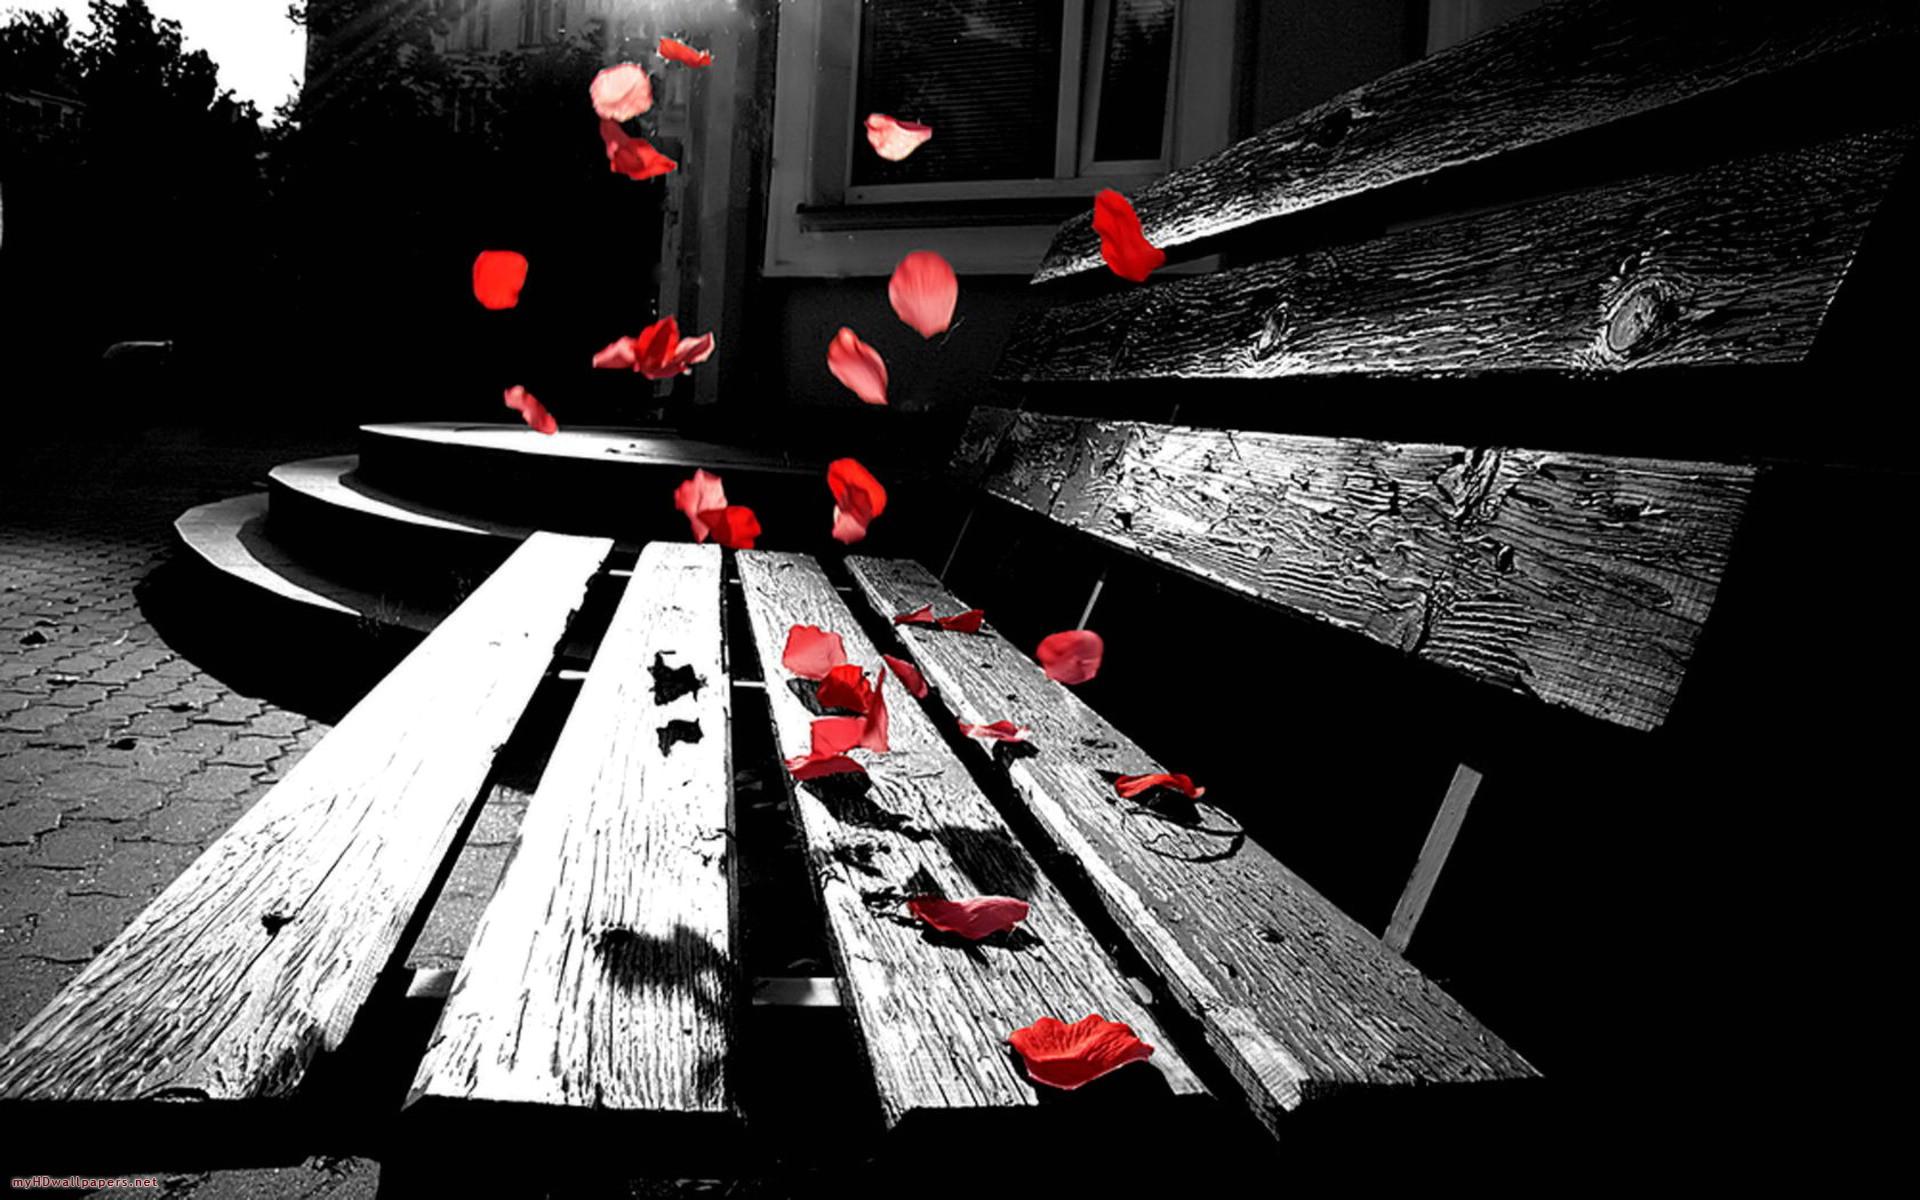 Romantic Wallpapers